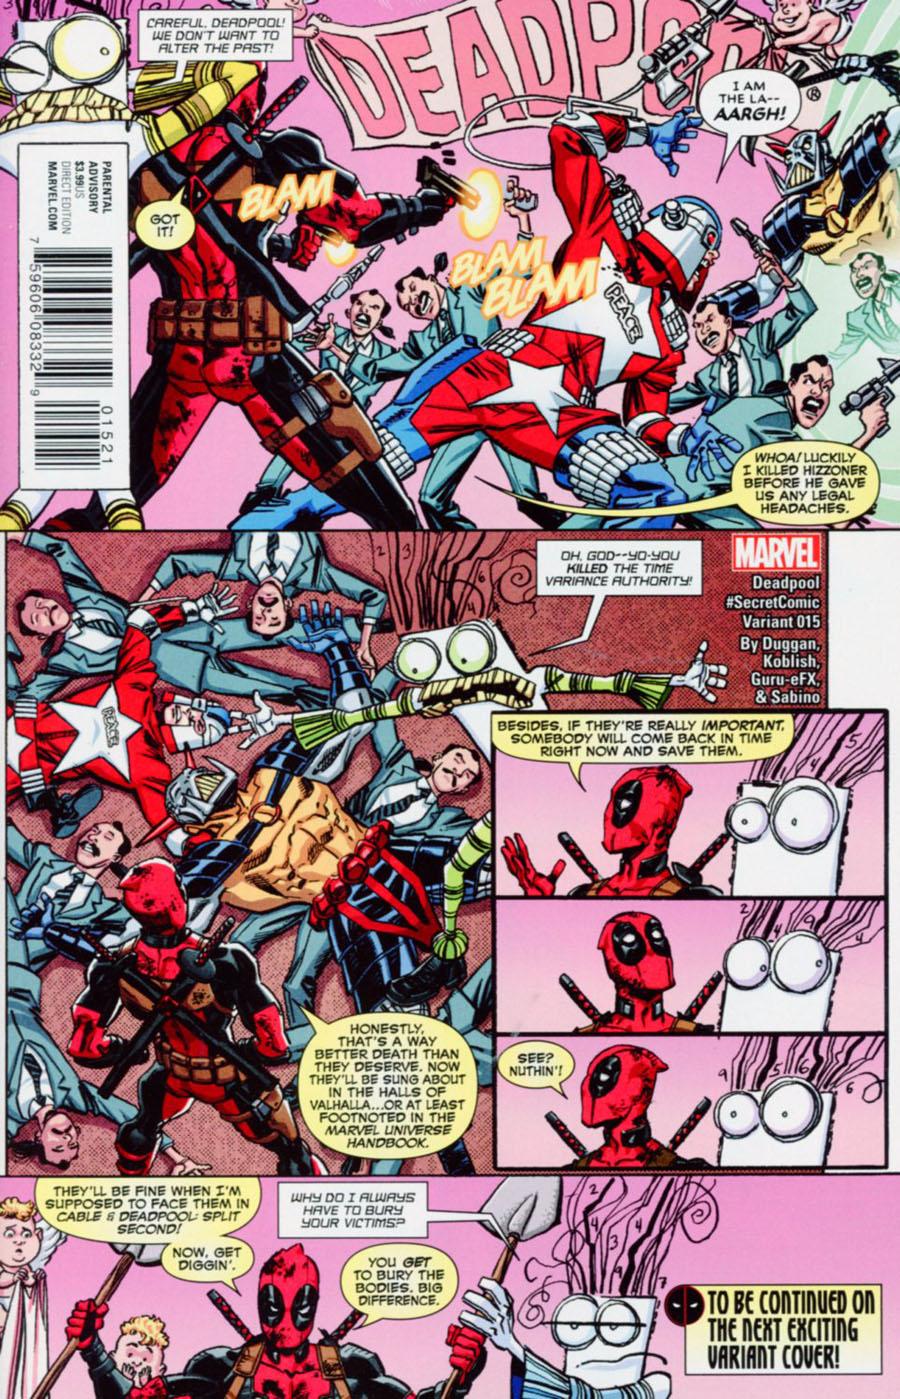 Deadpool Vol 5 #15 Cover B Variant Scott Koblish Secret Comic Cover (Civil War II Tie-In)